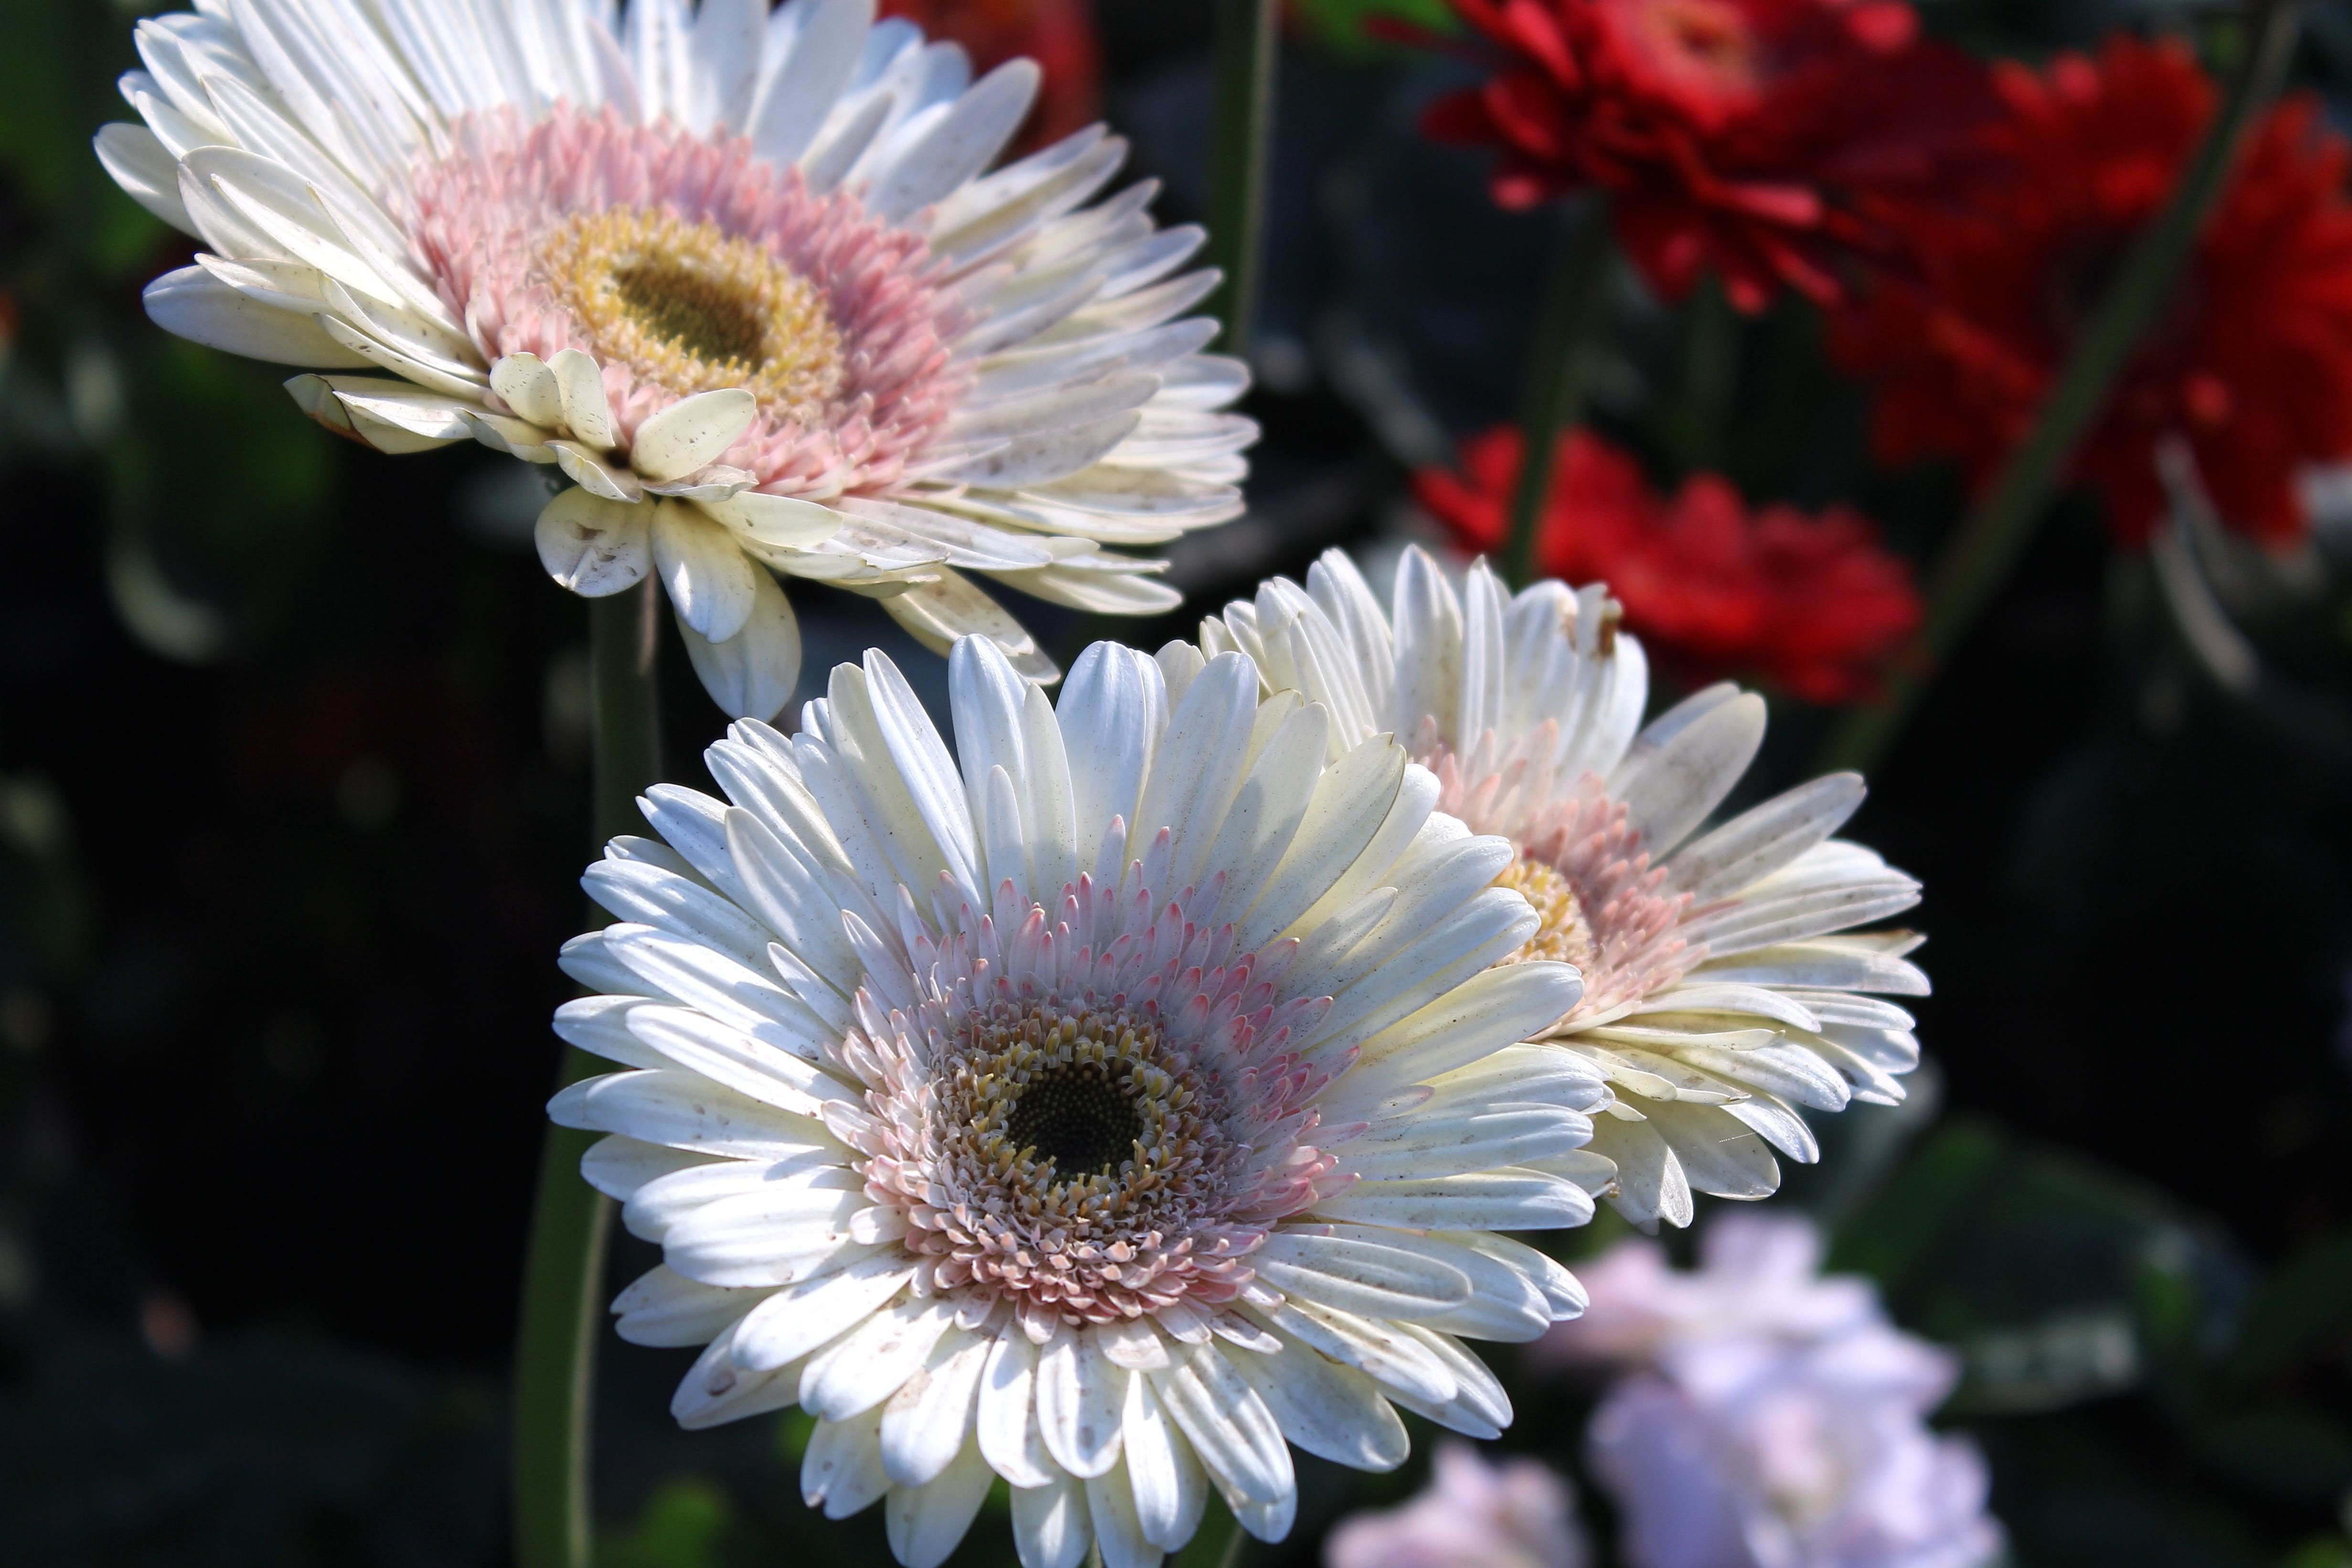 Flor hermosa, flor, margarita, rosa, pétalo, flor, planta, jardín